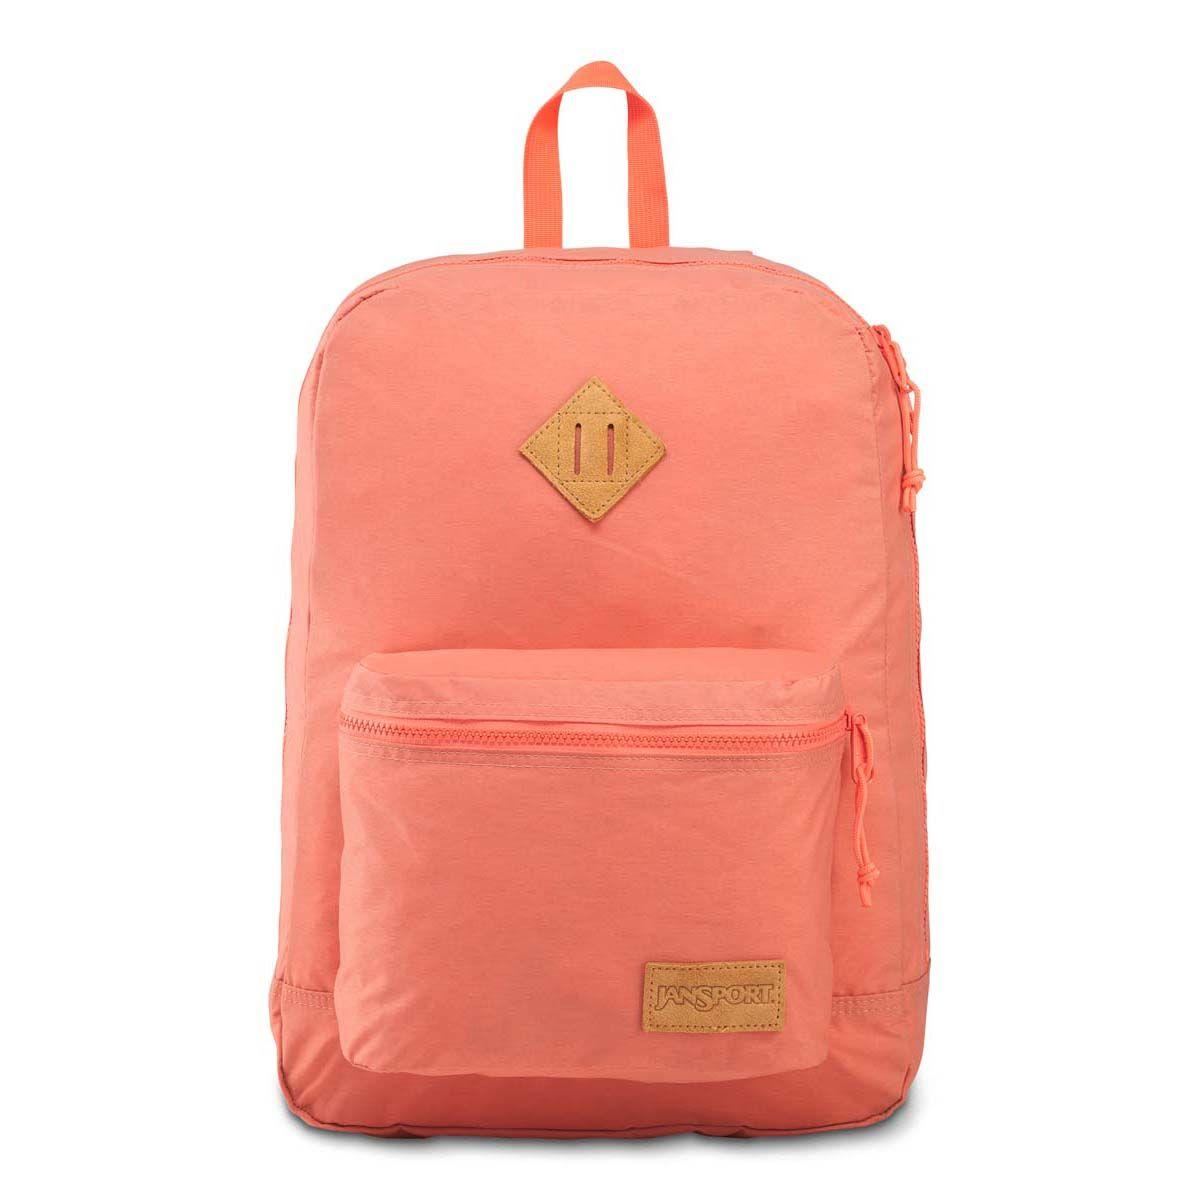 JanSport Super Lite Backpack in Crabapple/Sedona Sun